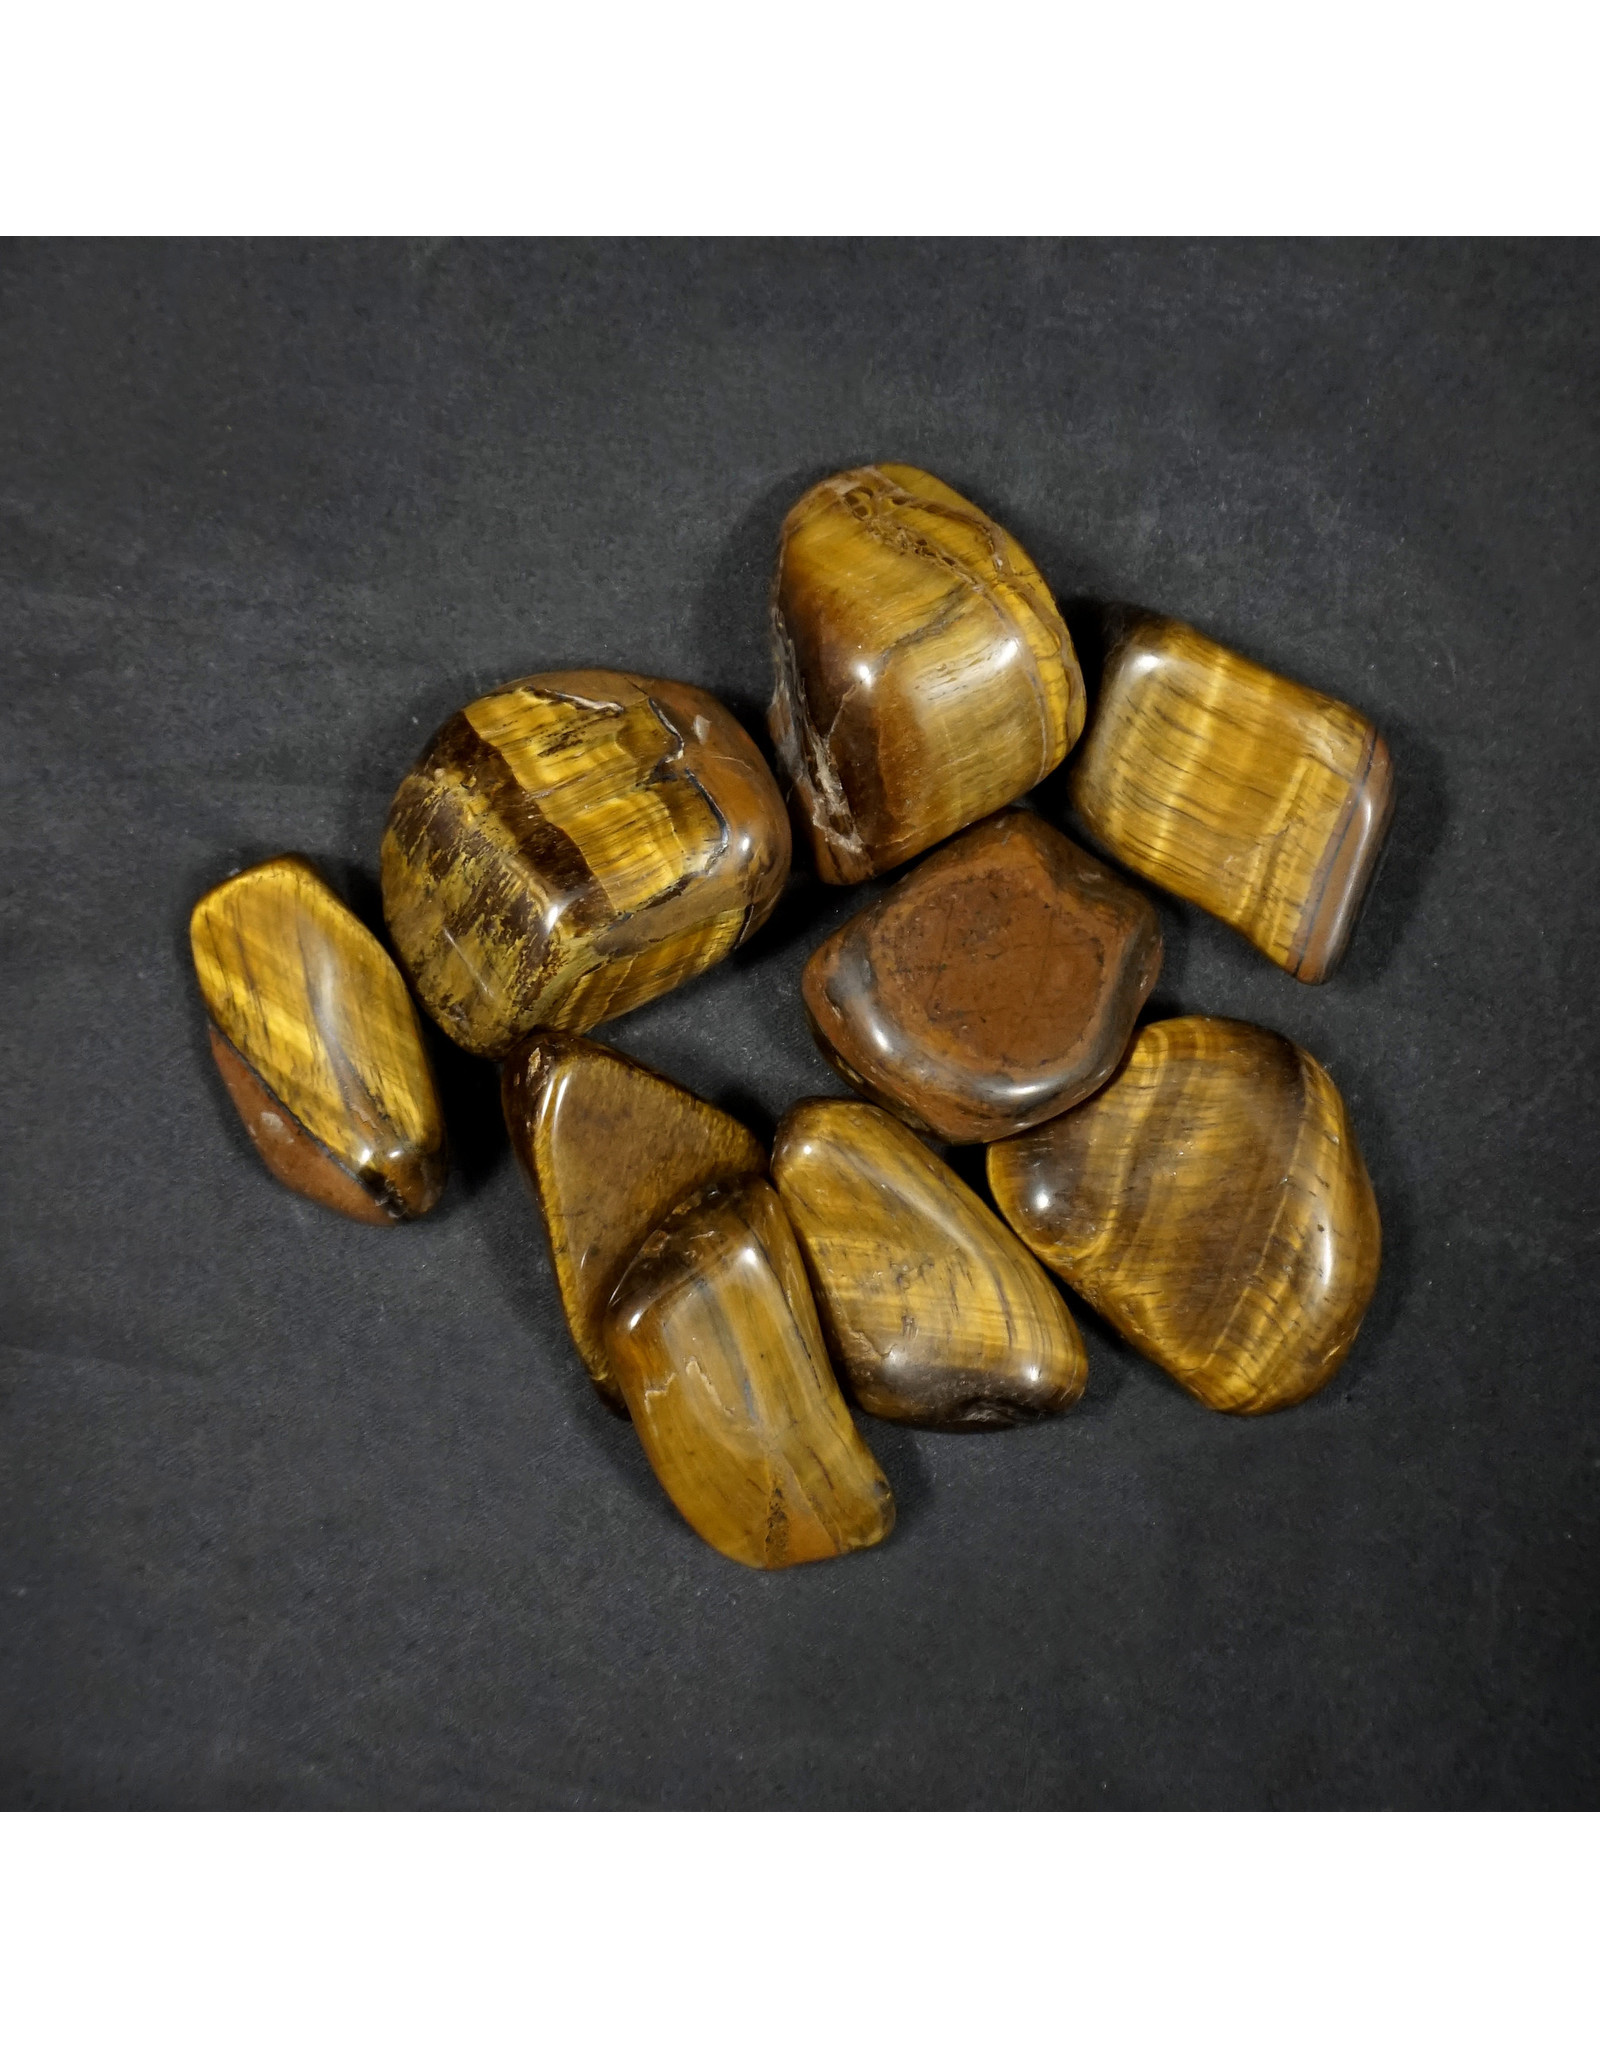 Gold Tiger's Eye Large Tumbled Stone